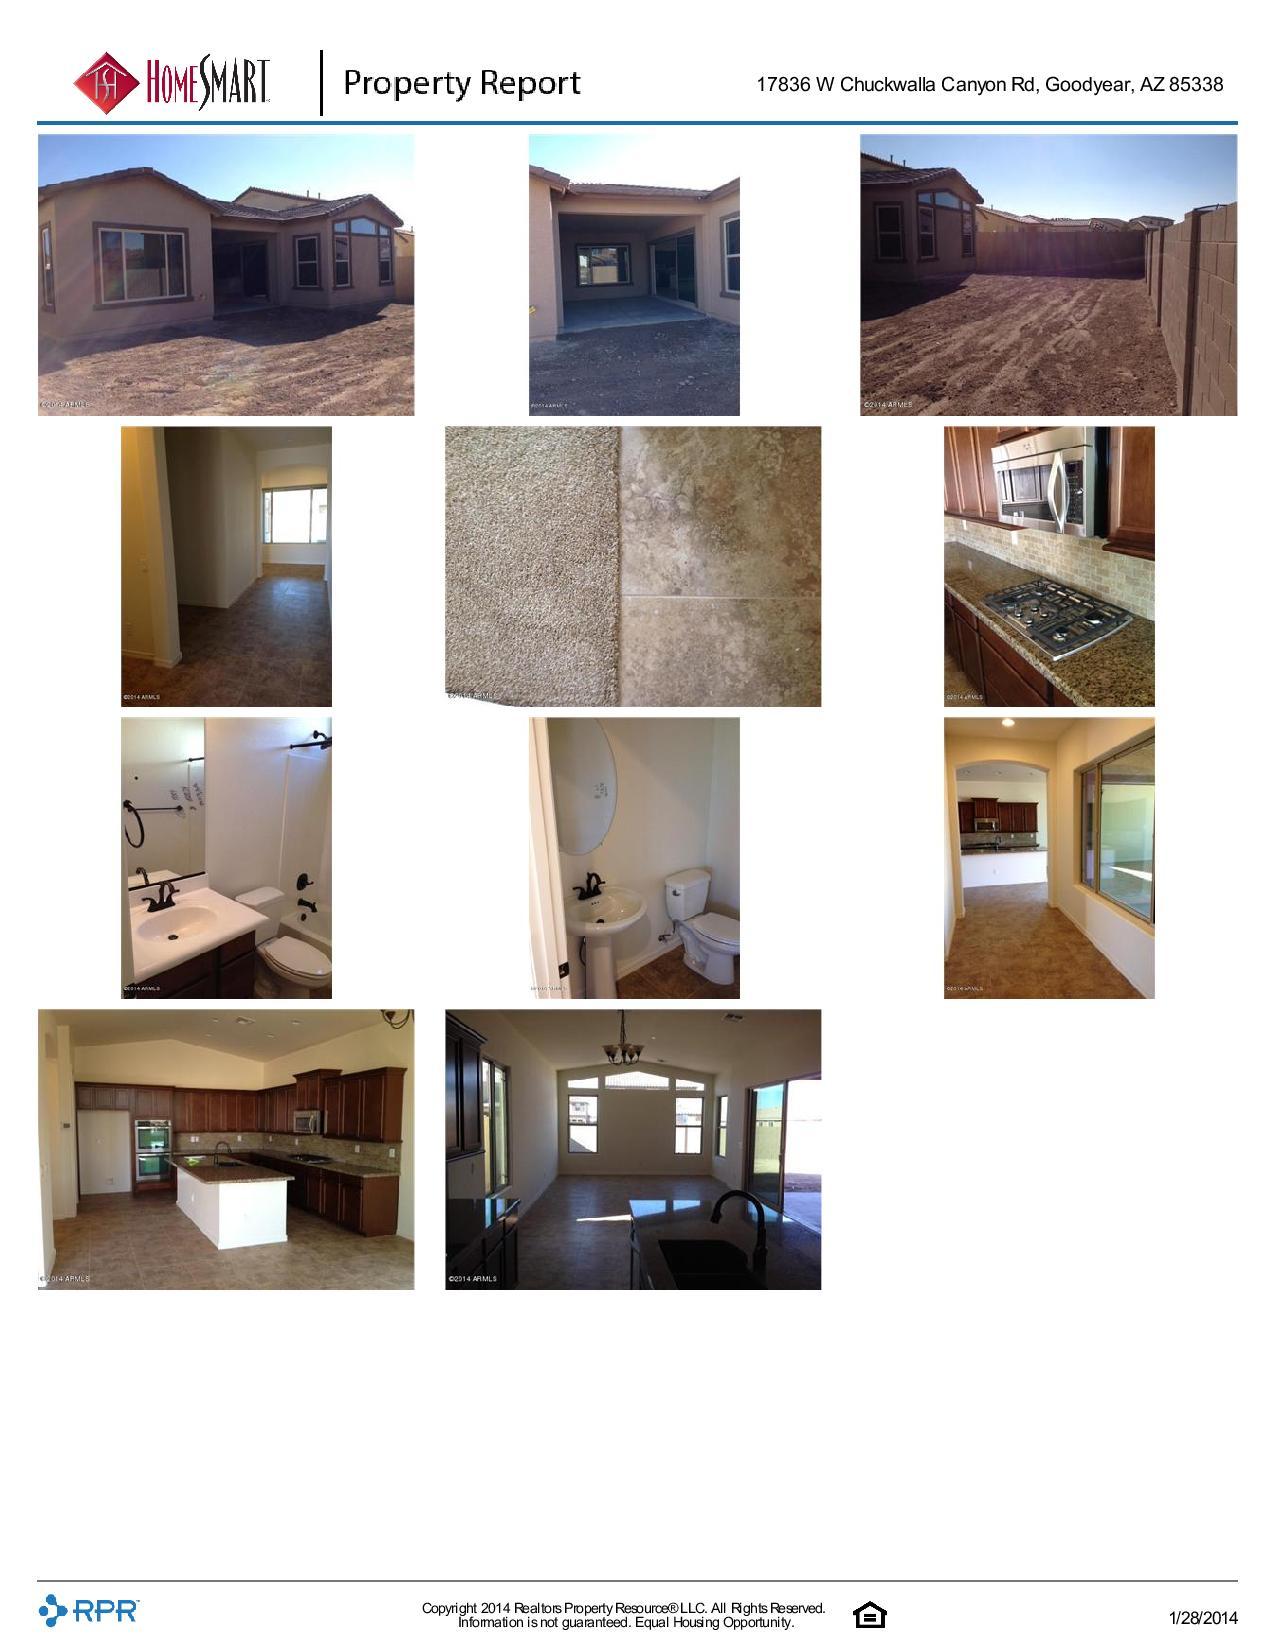 17836-W-Chuckwalla-Canyon-Rd-Goodyear-AZ-85338.pdf-page-006